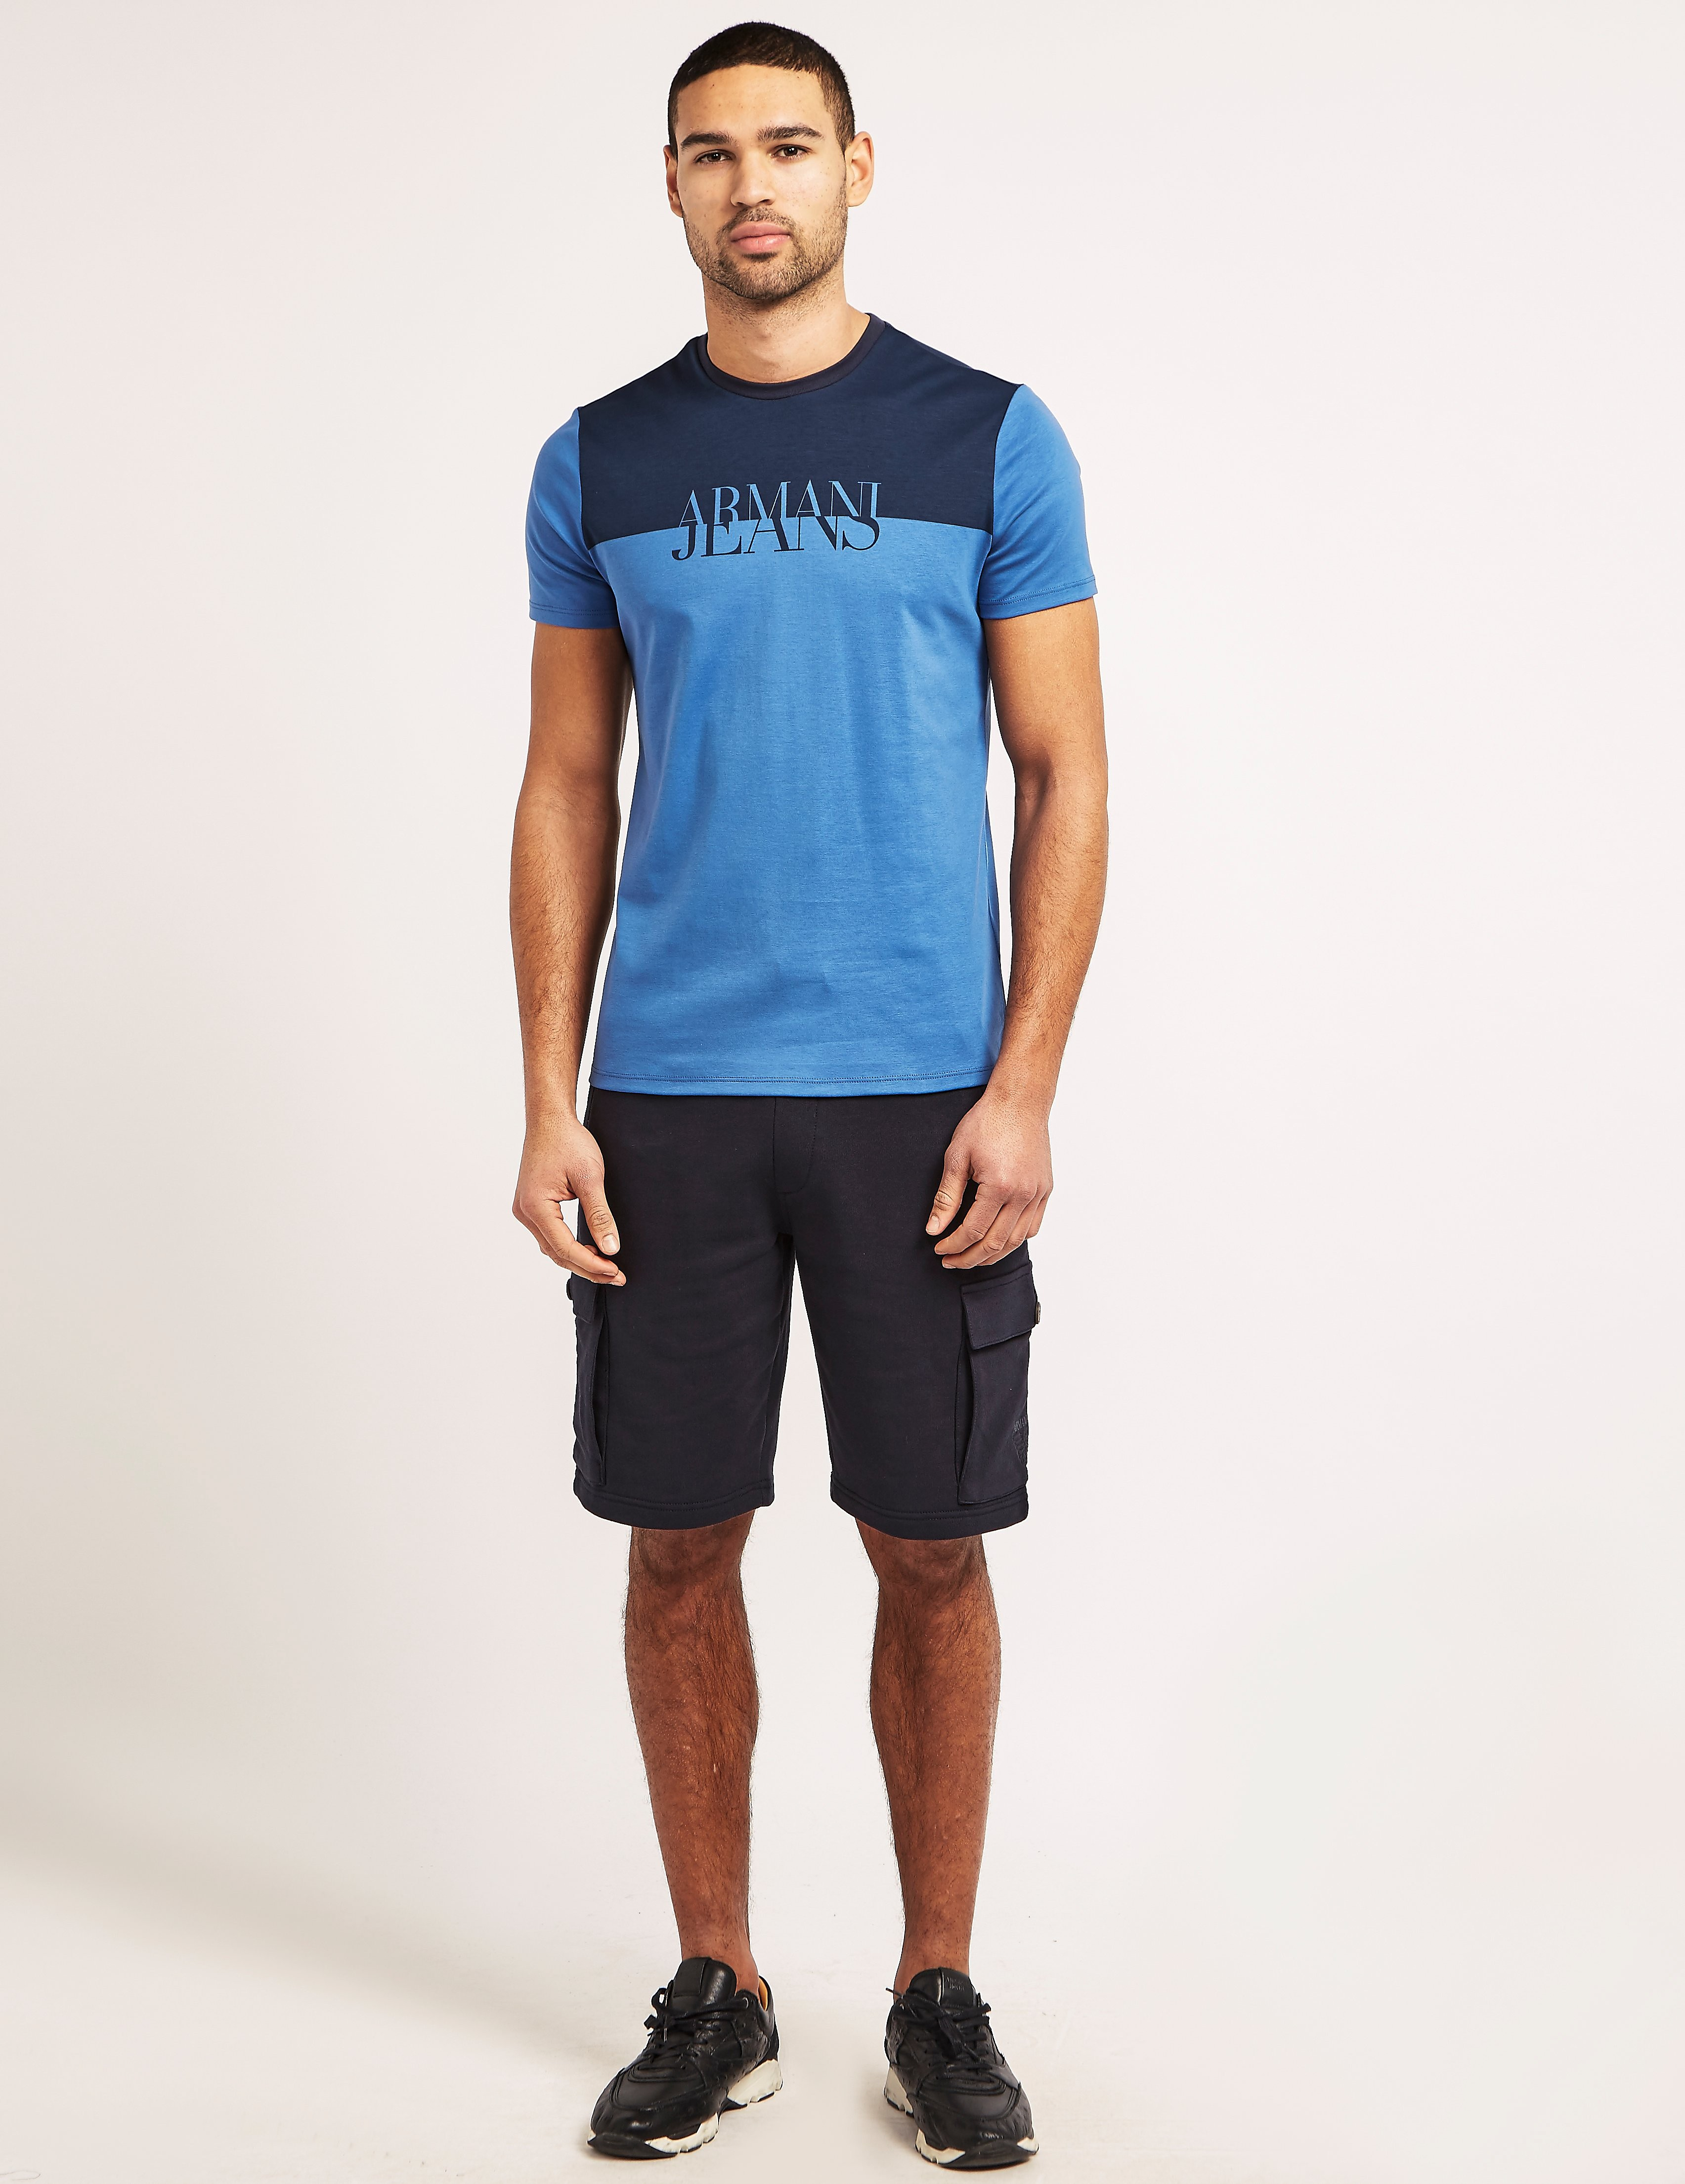 Armani Jeans Contrast Print T-Shirt